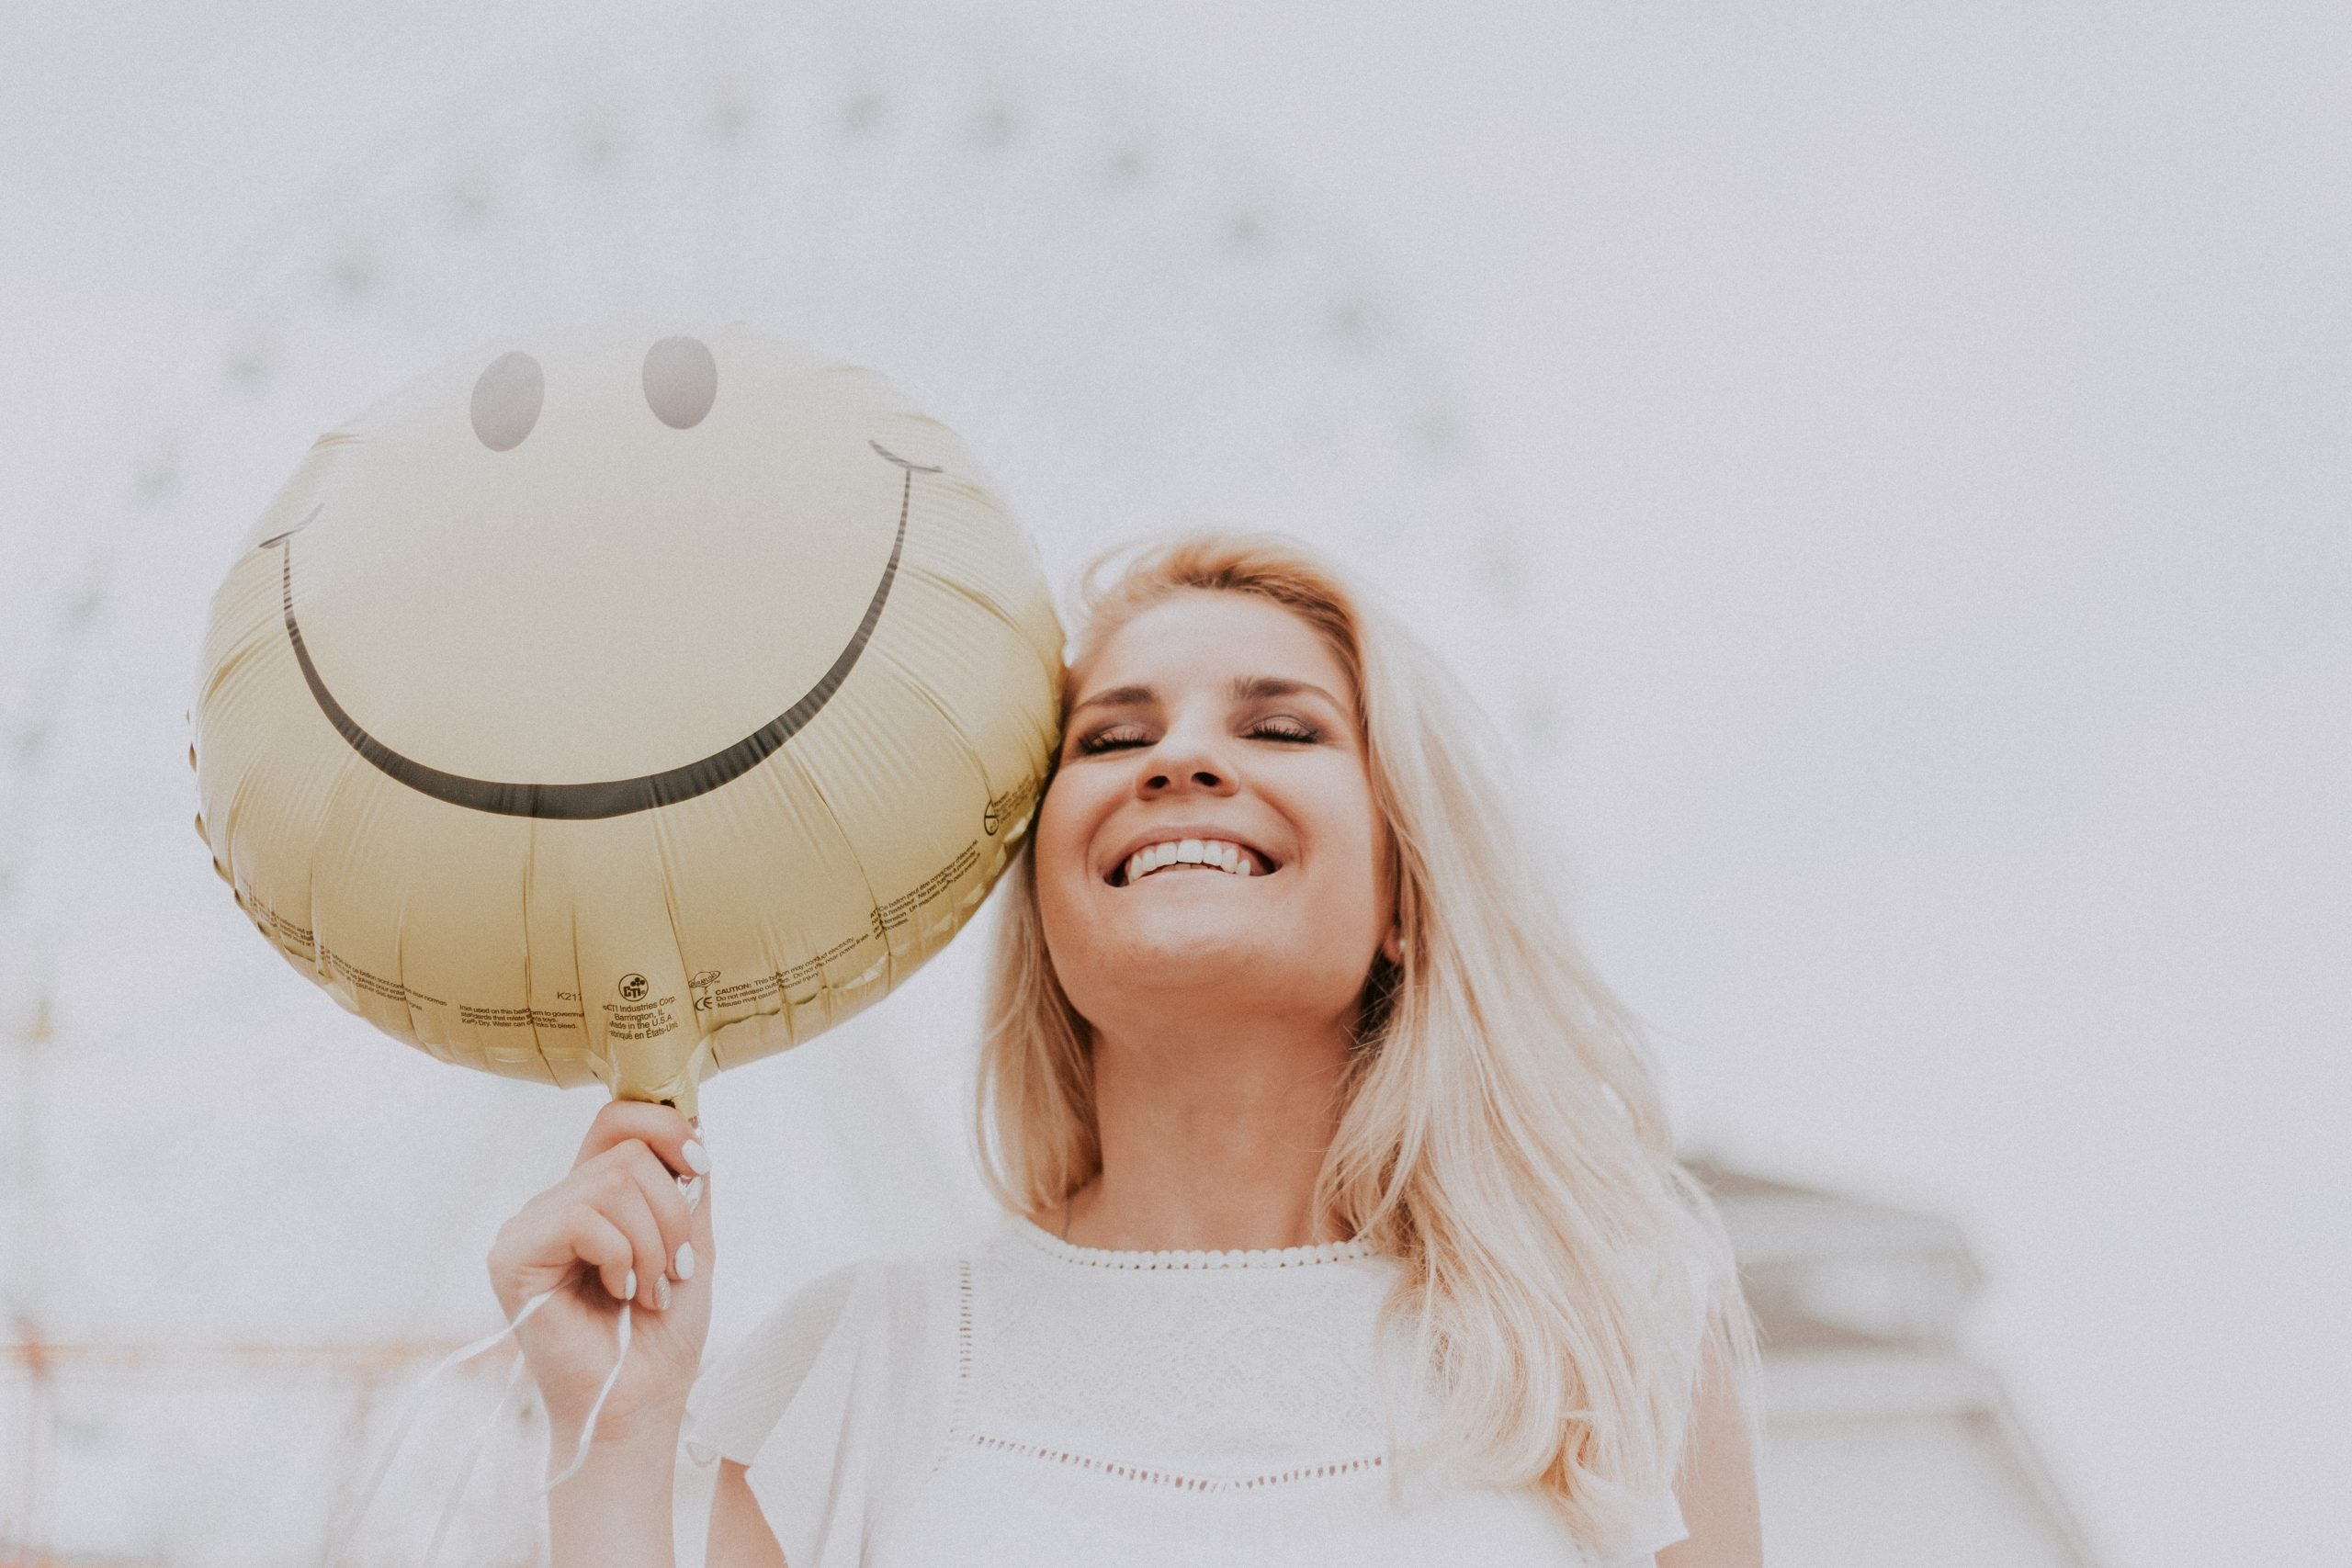 Chica sonriente globo